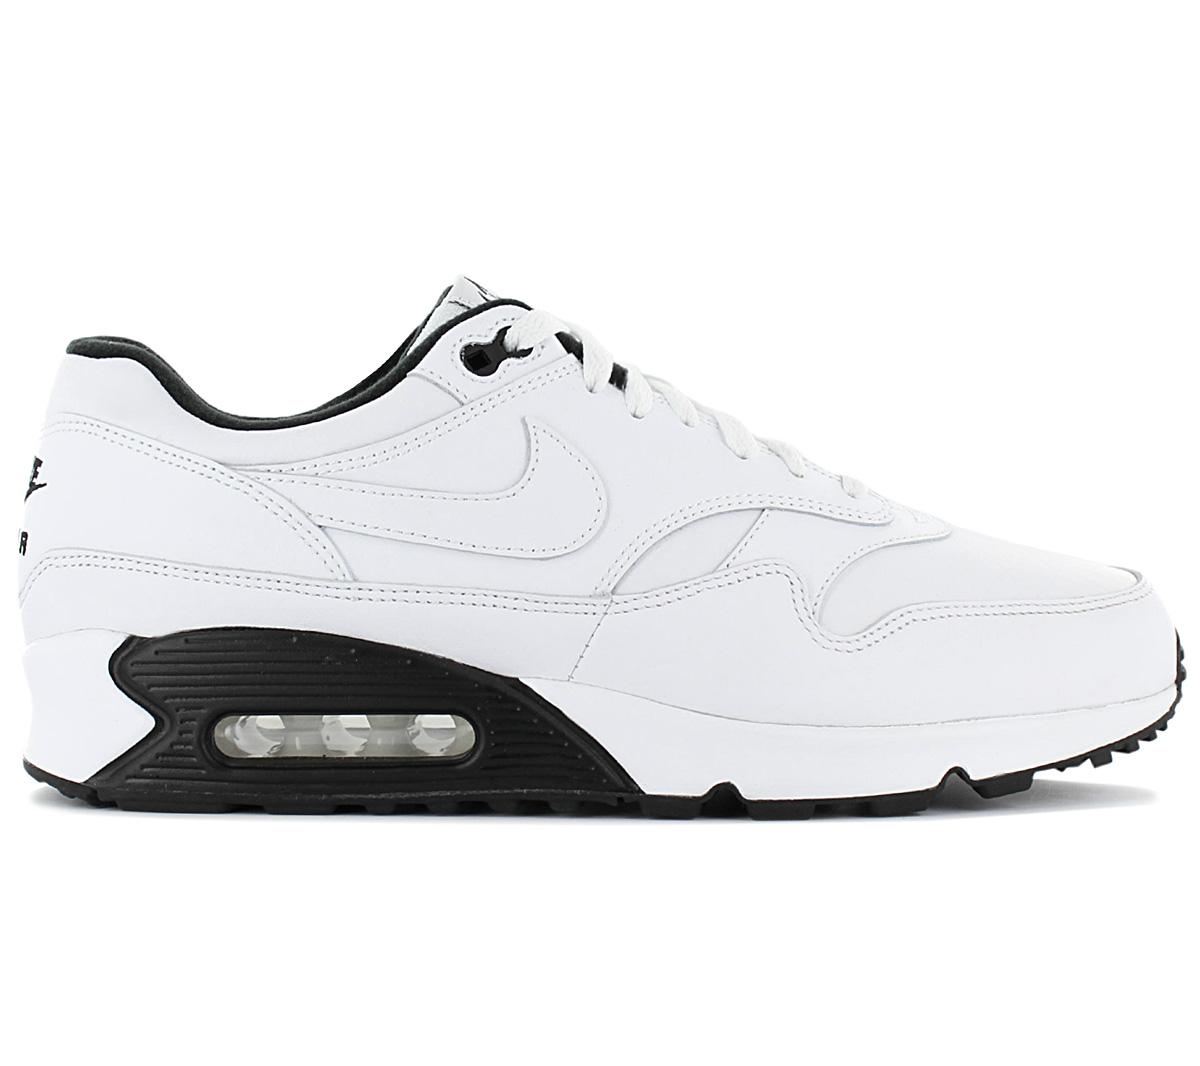 Details zu Nike Air Max 901 Leather Herren Sneaker AJ7695 106 Leder Weiß Herren Sneaker